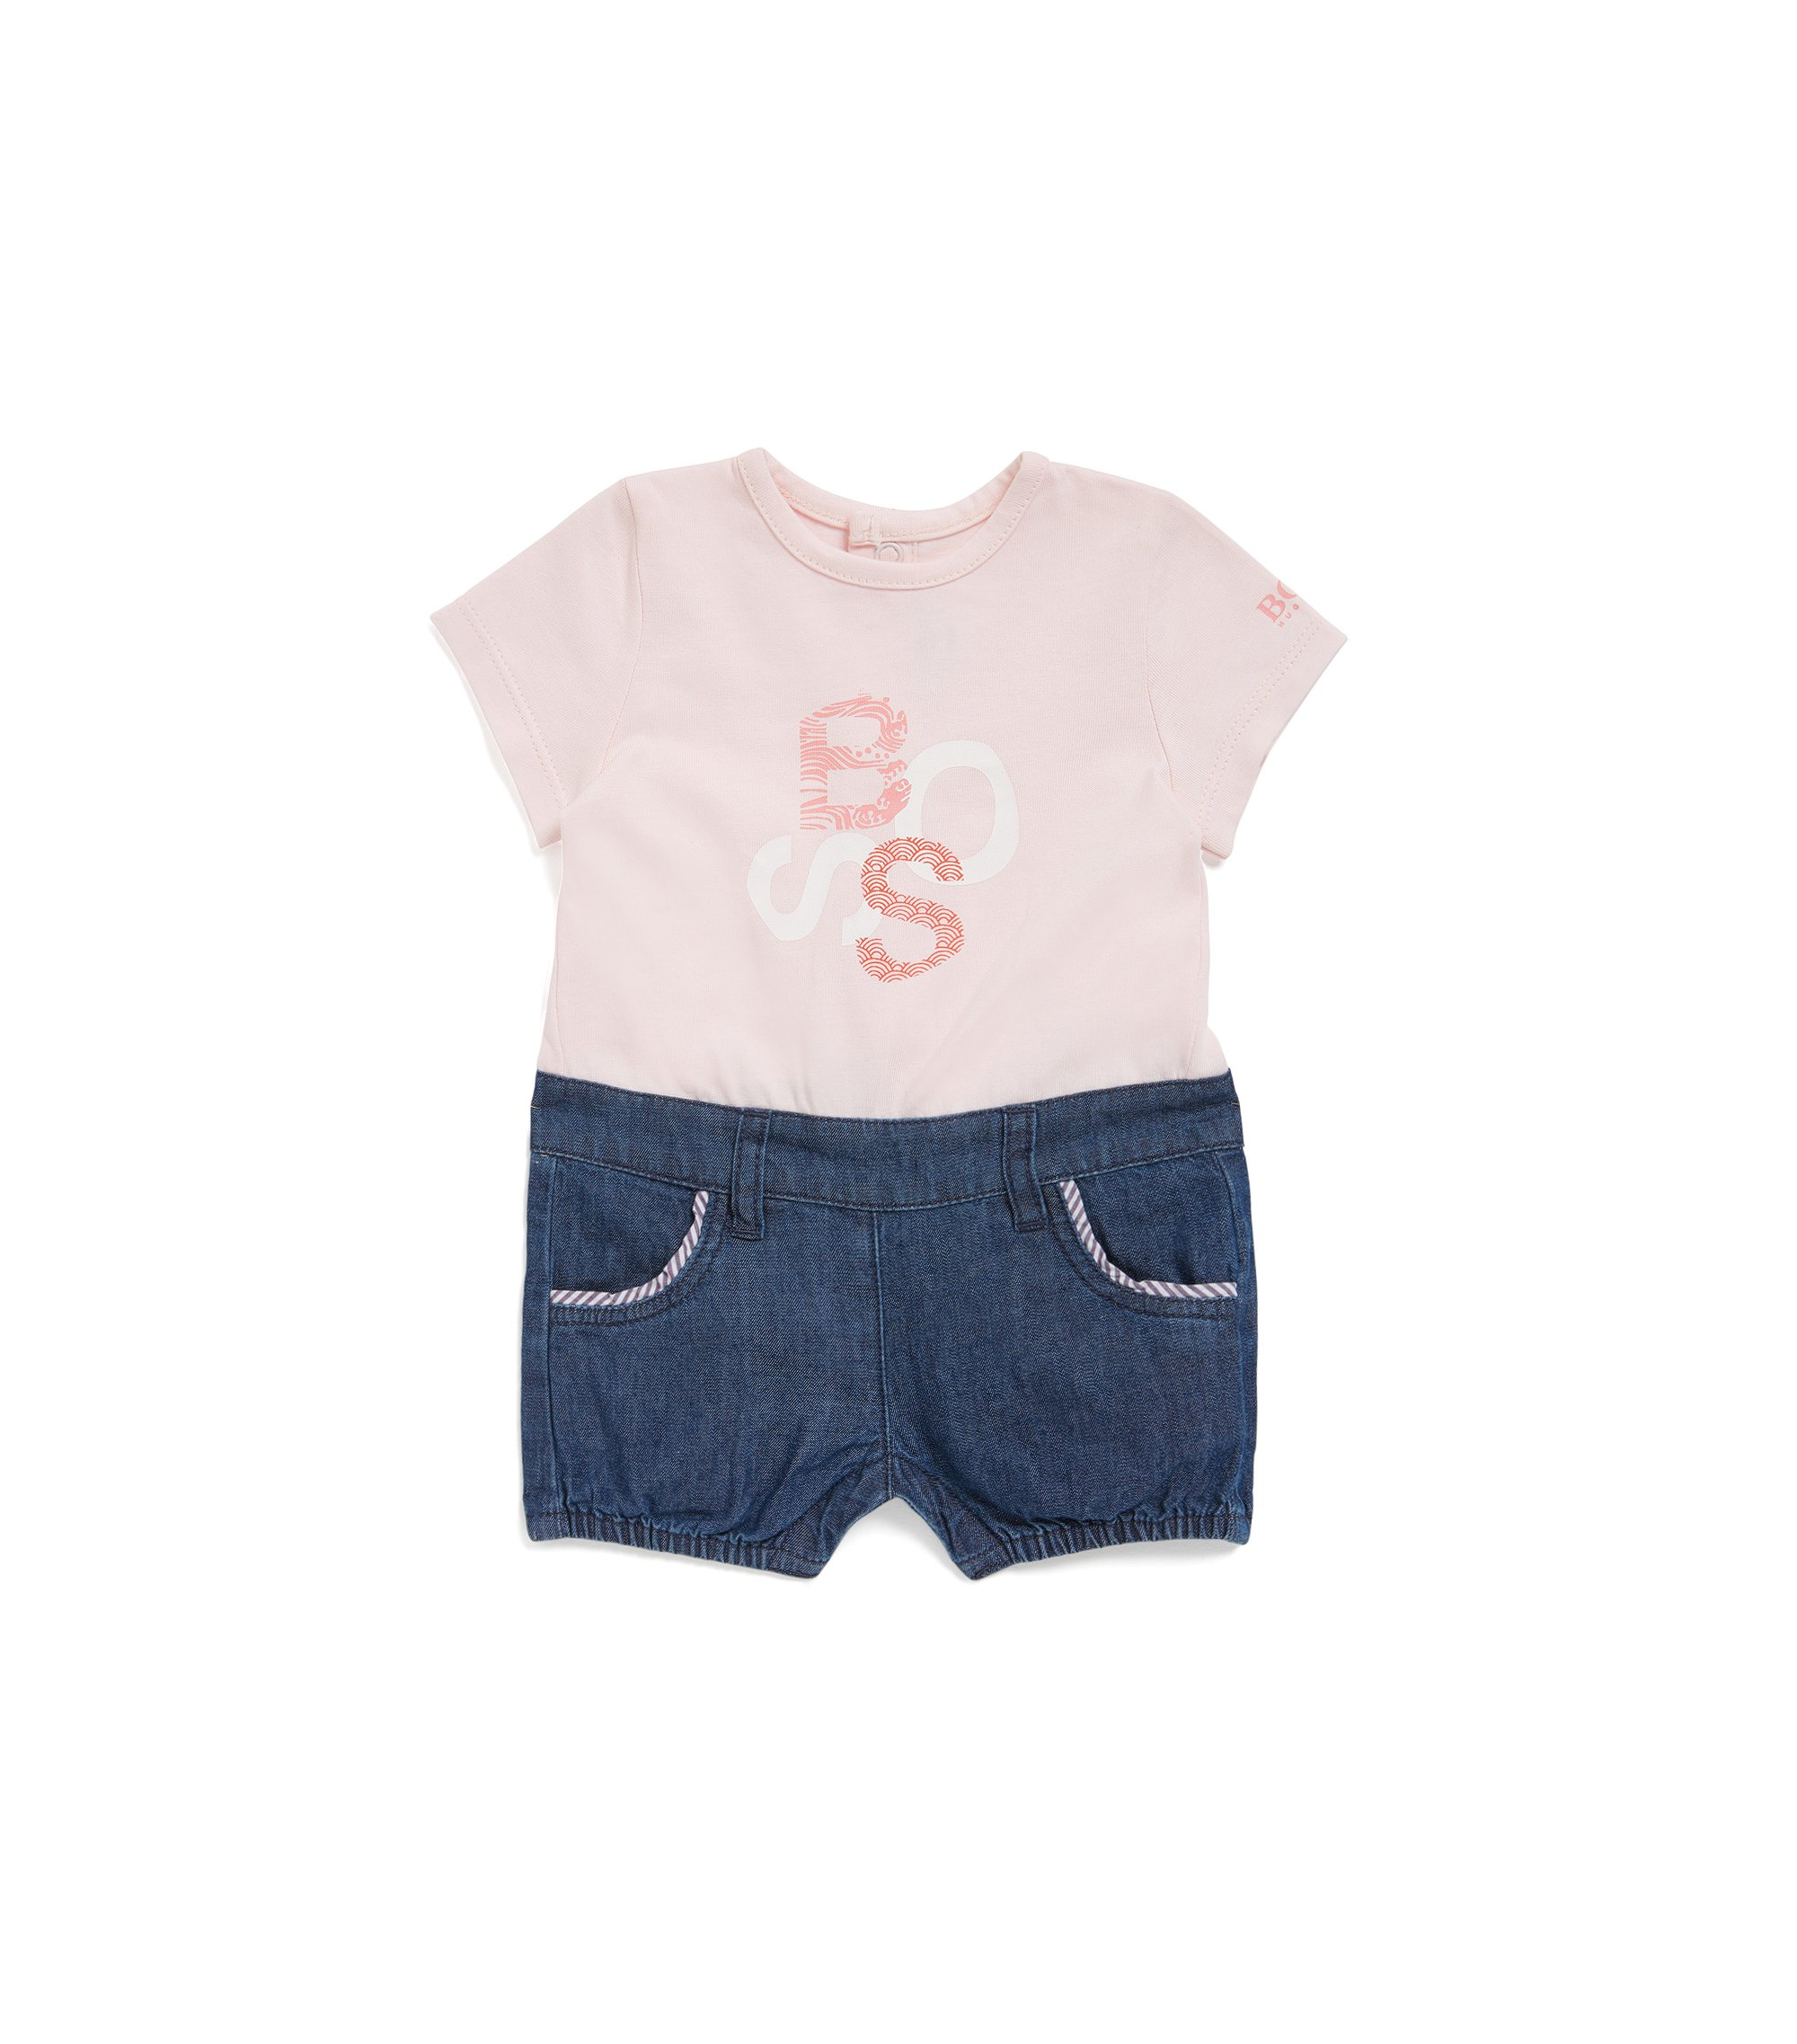 Baby-Overall im Zweiteiler-Look: 'J94185', Hellrosa